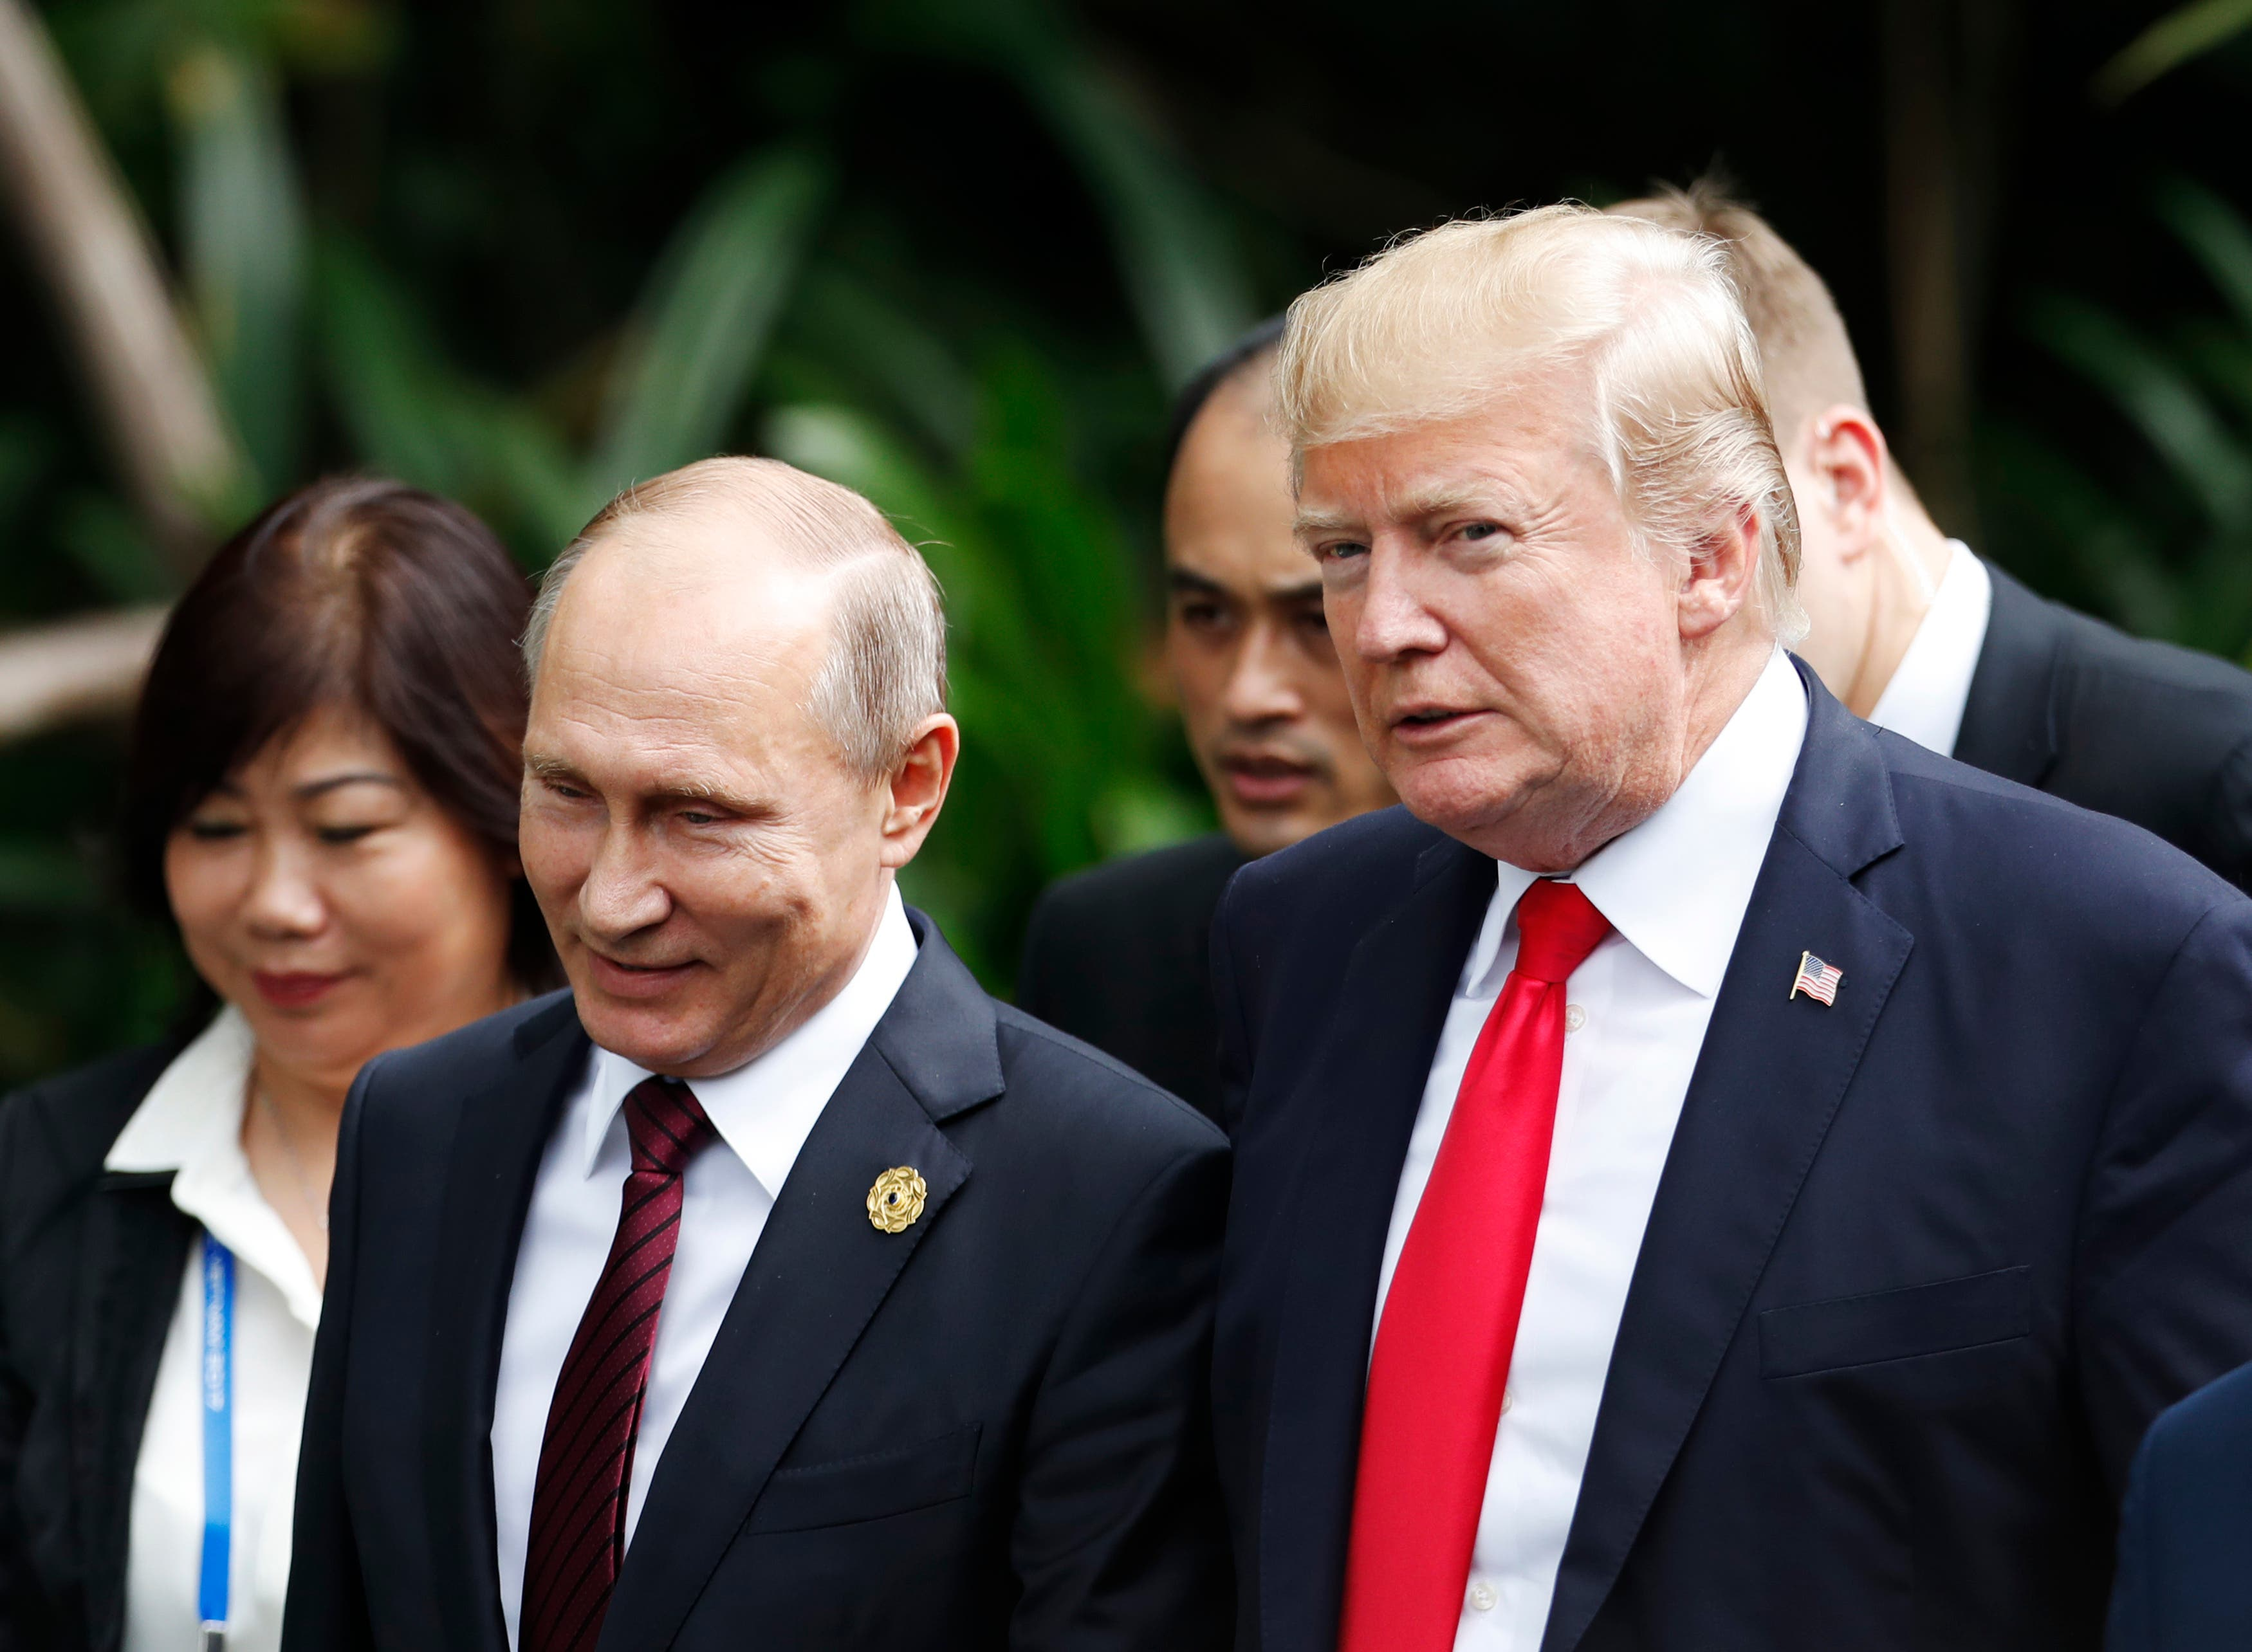 El esperado encuentro Trump-Putin en cumbre APEC